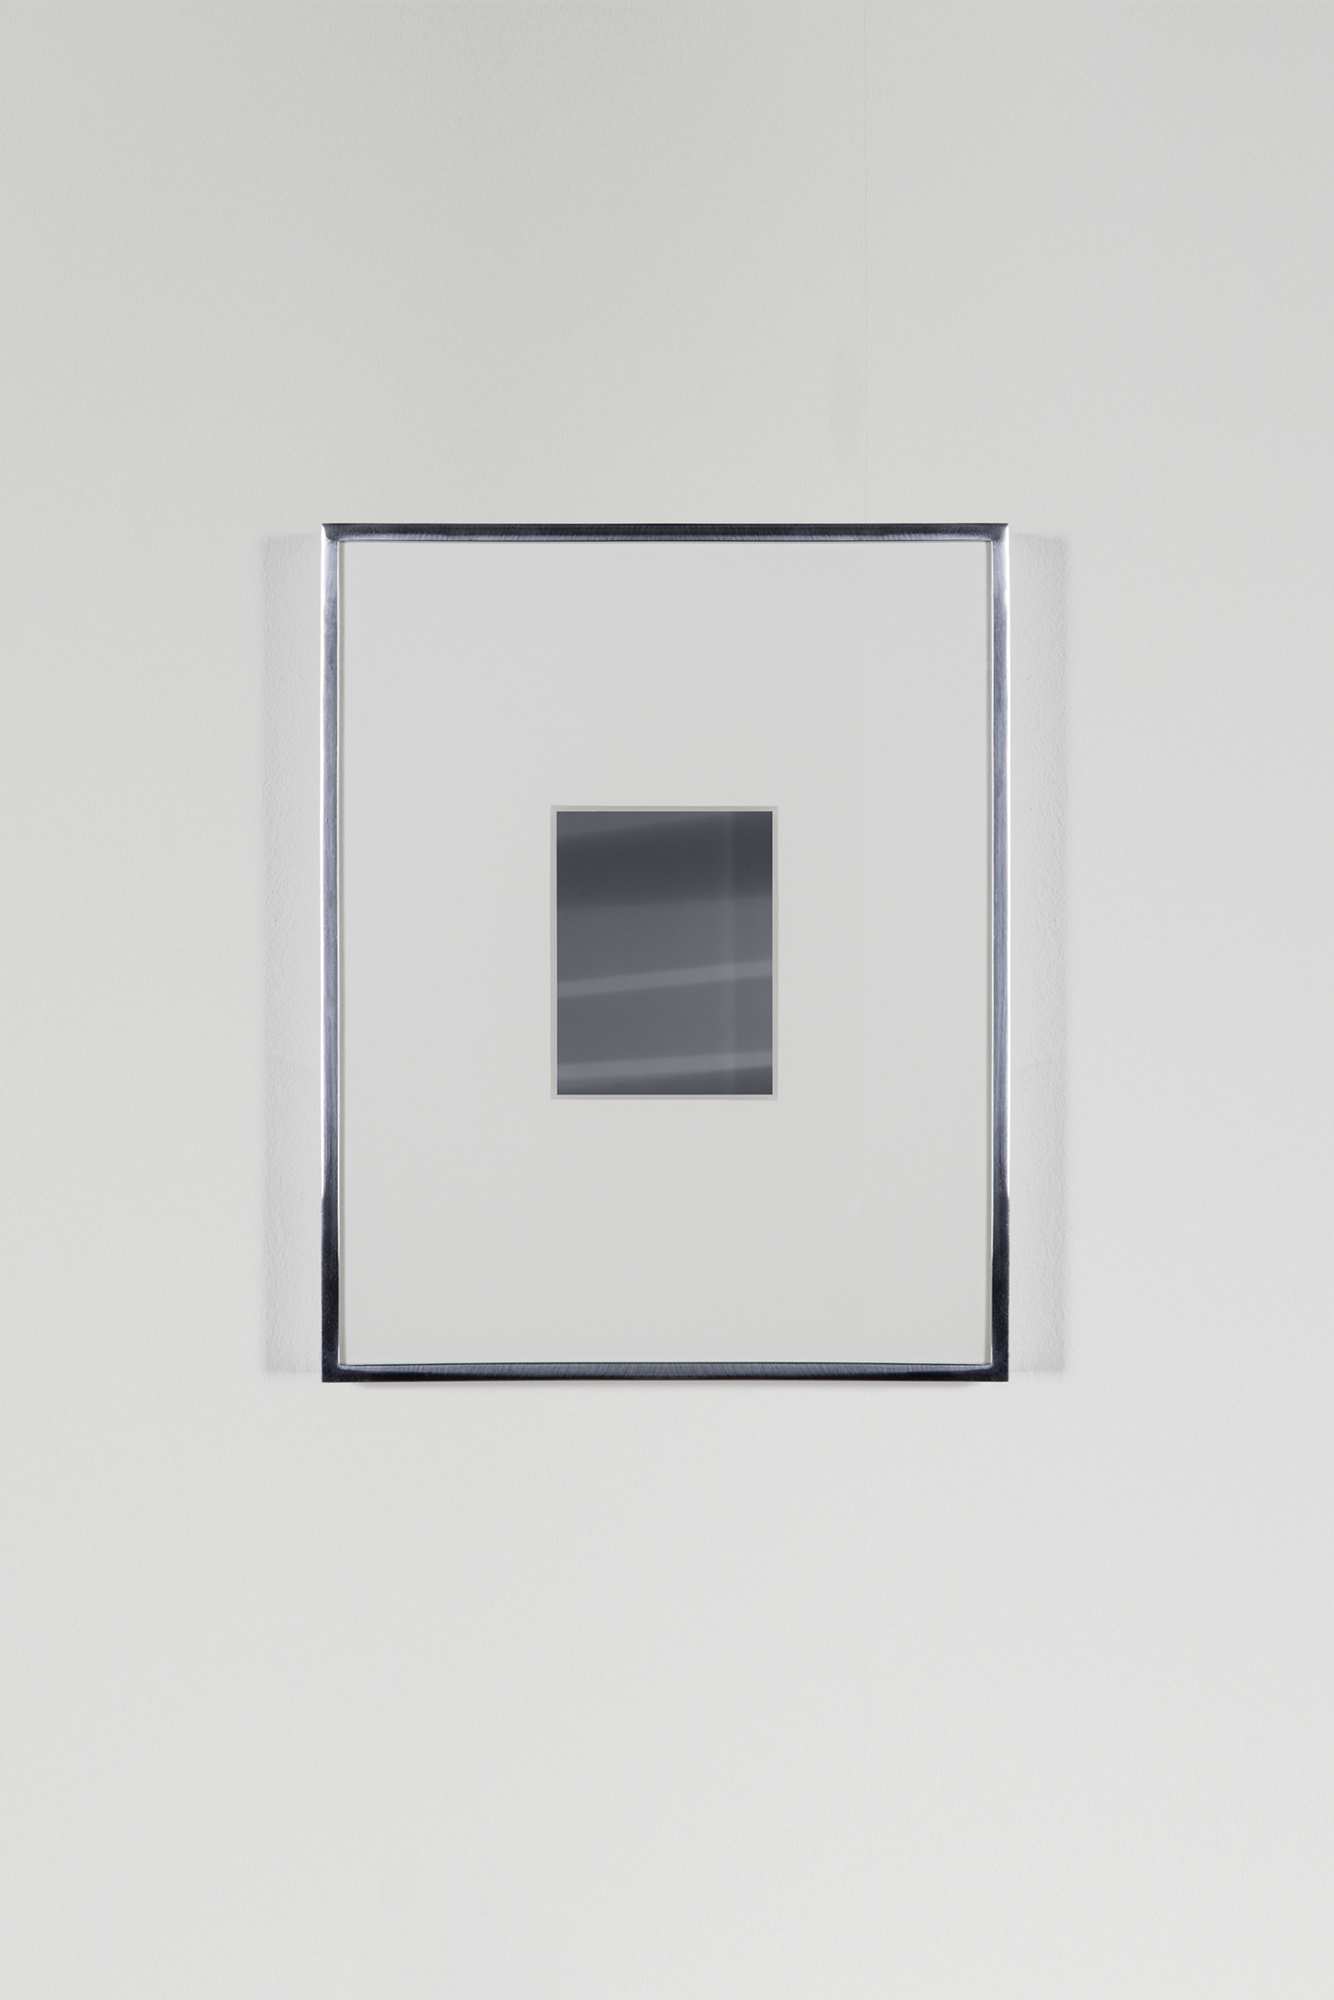 Transparency (Negative) [Kodak Portra 400NC Em. No. 1022: November 5–14, 2015 LAX/MEX MEX/EWR EWR/LAX]    2017   Epson Ultrachrome K3 archival ink jet print on Museo Silver Rag Paper  14 x 11 inches   Transparencies, 2014–